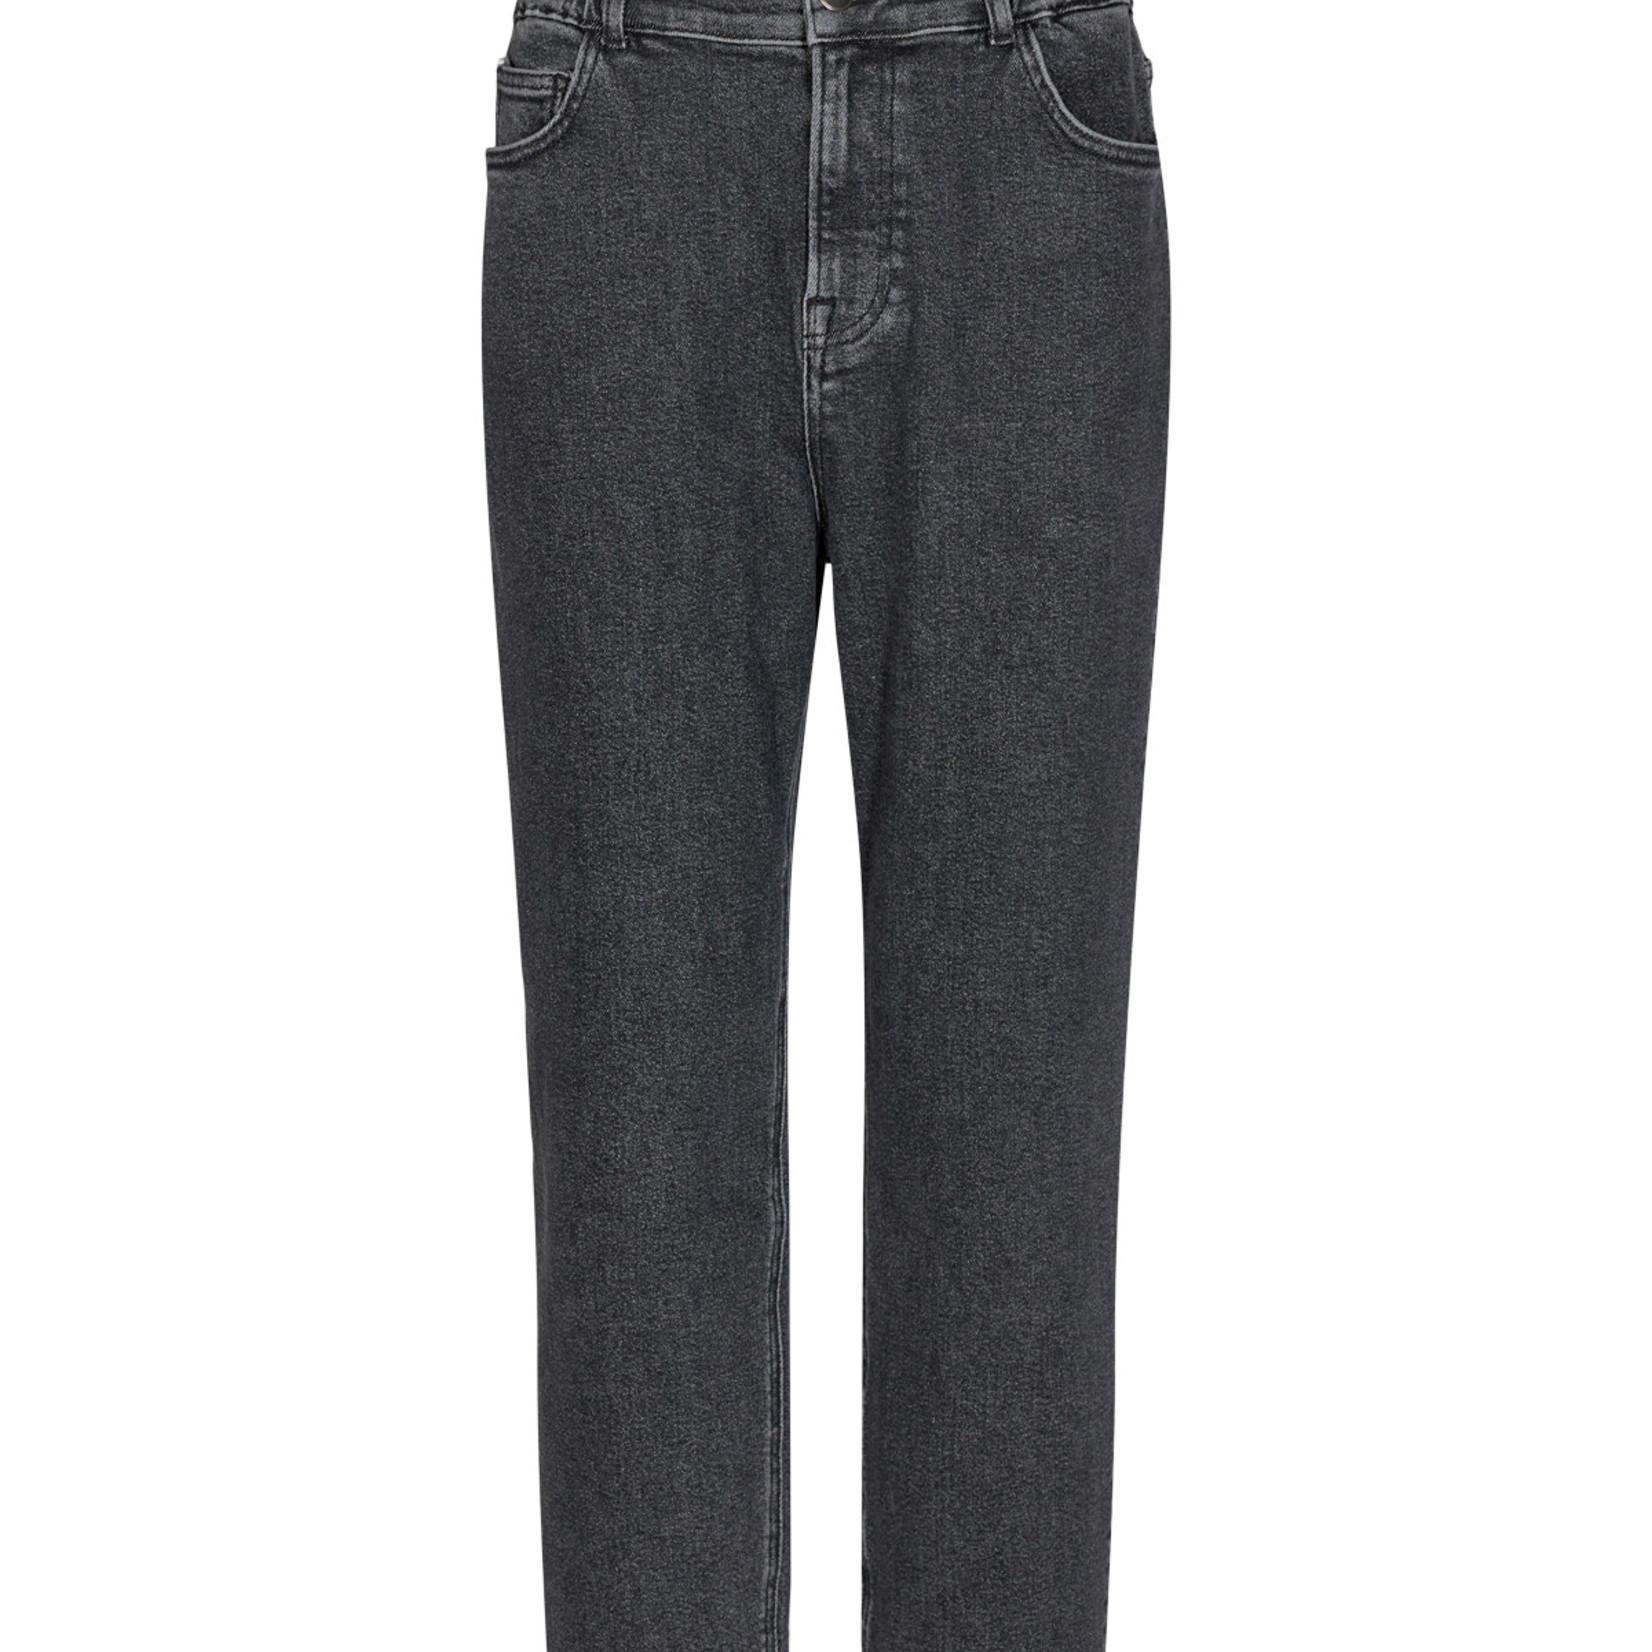 NÜMPH NUCARBEINNA PANTS, mom jeans